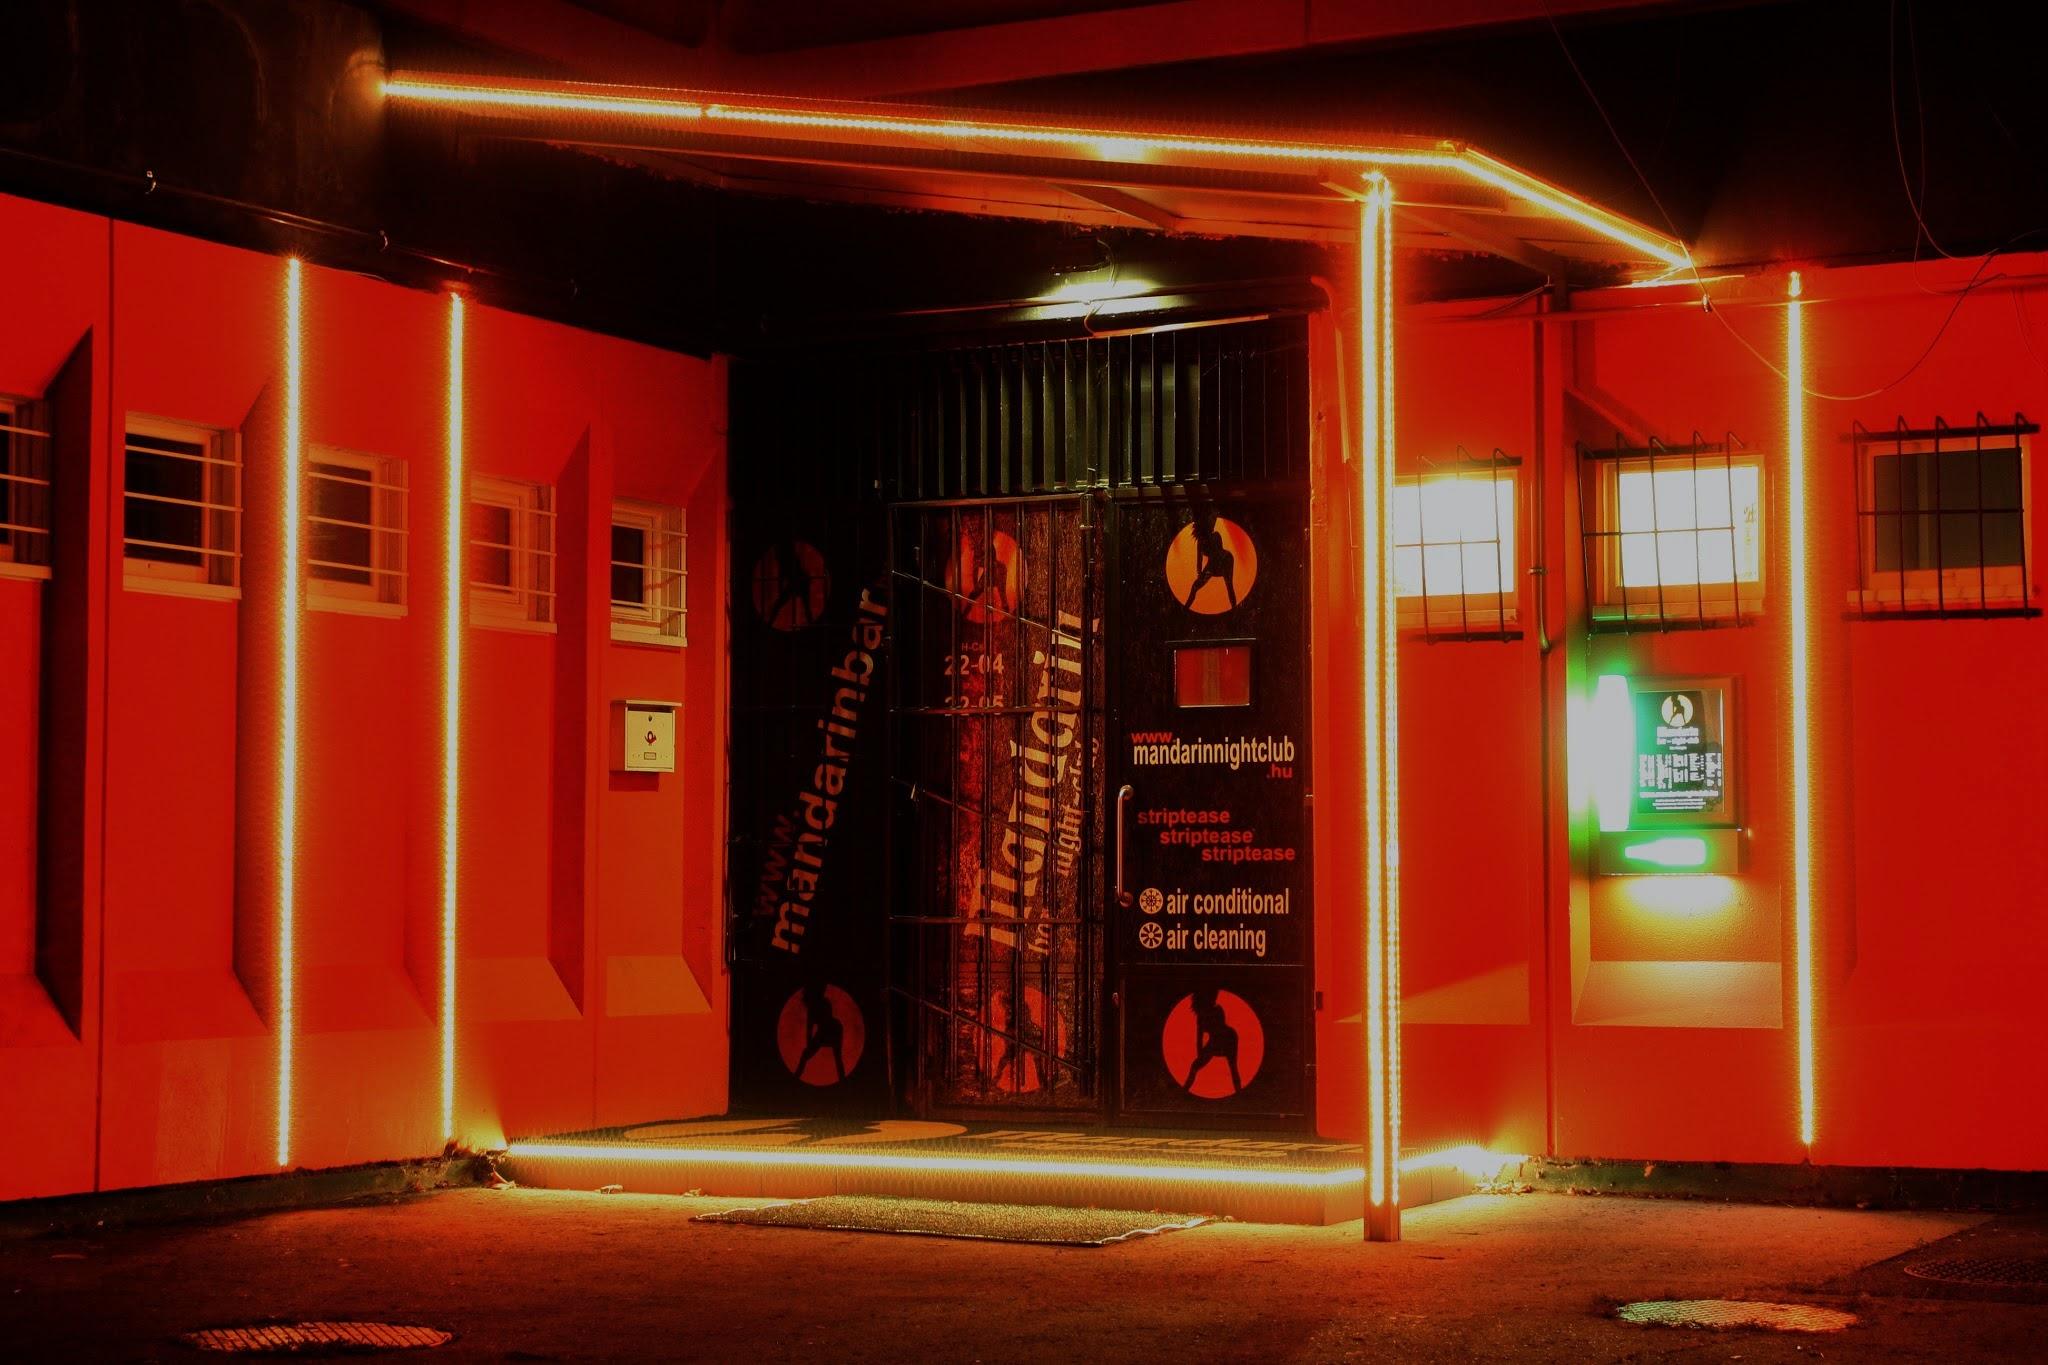 Mandarin Nightclub and Bar Streaptease